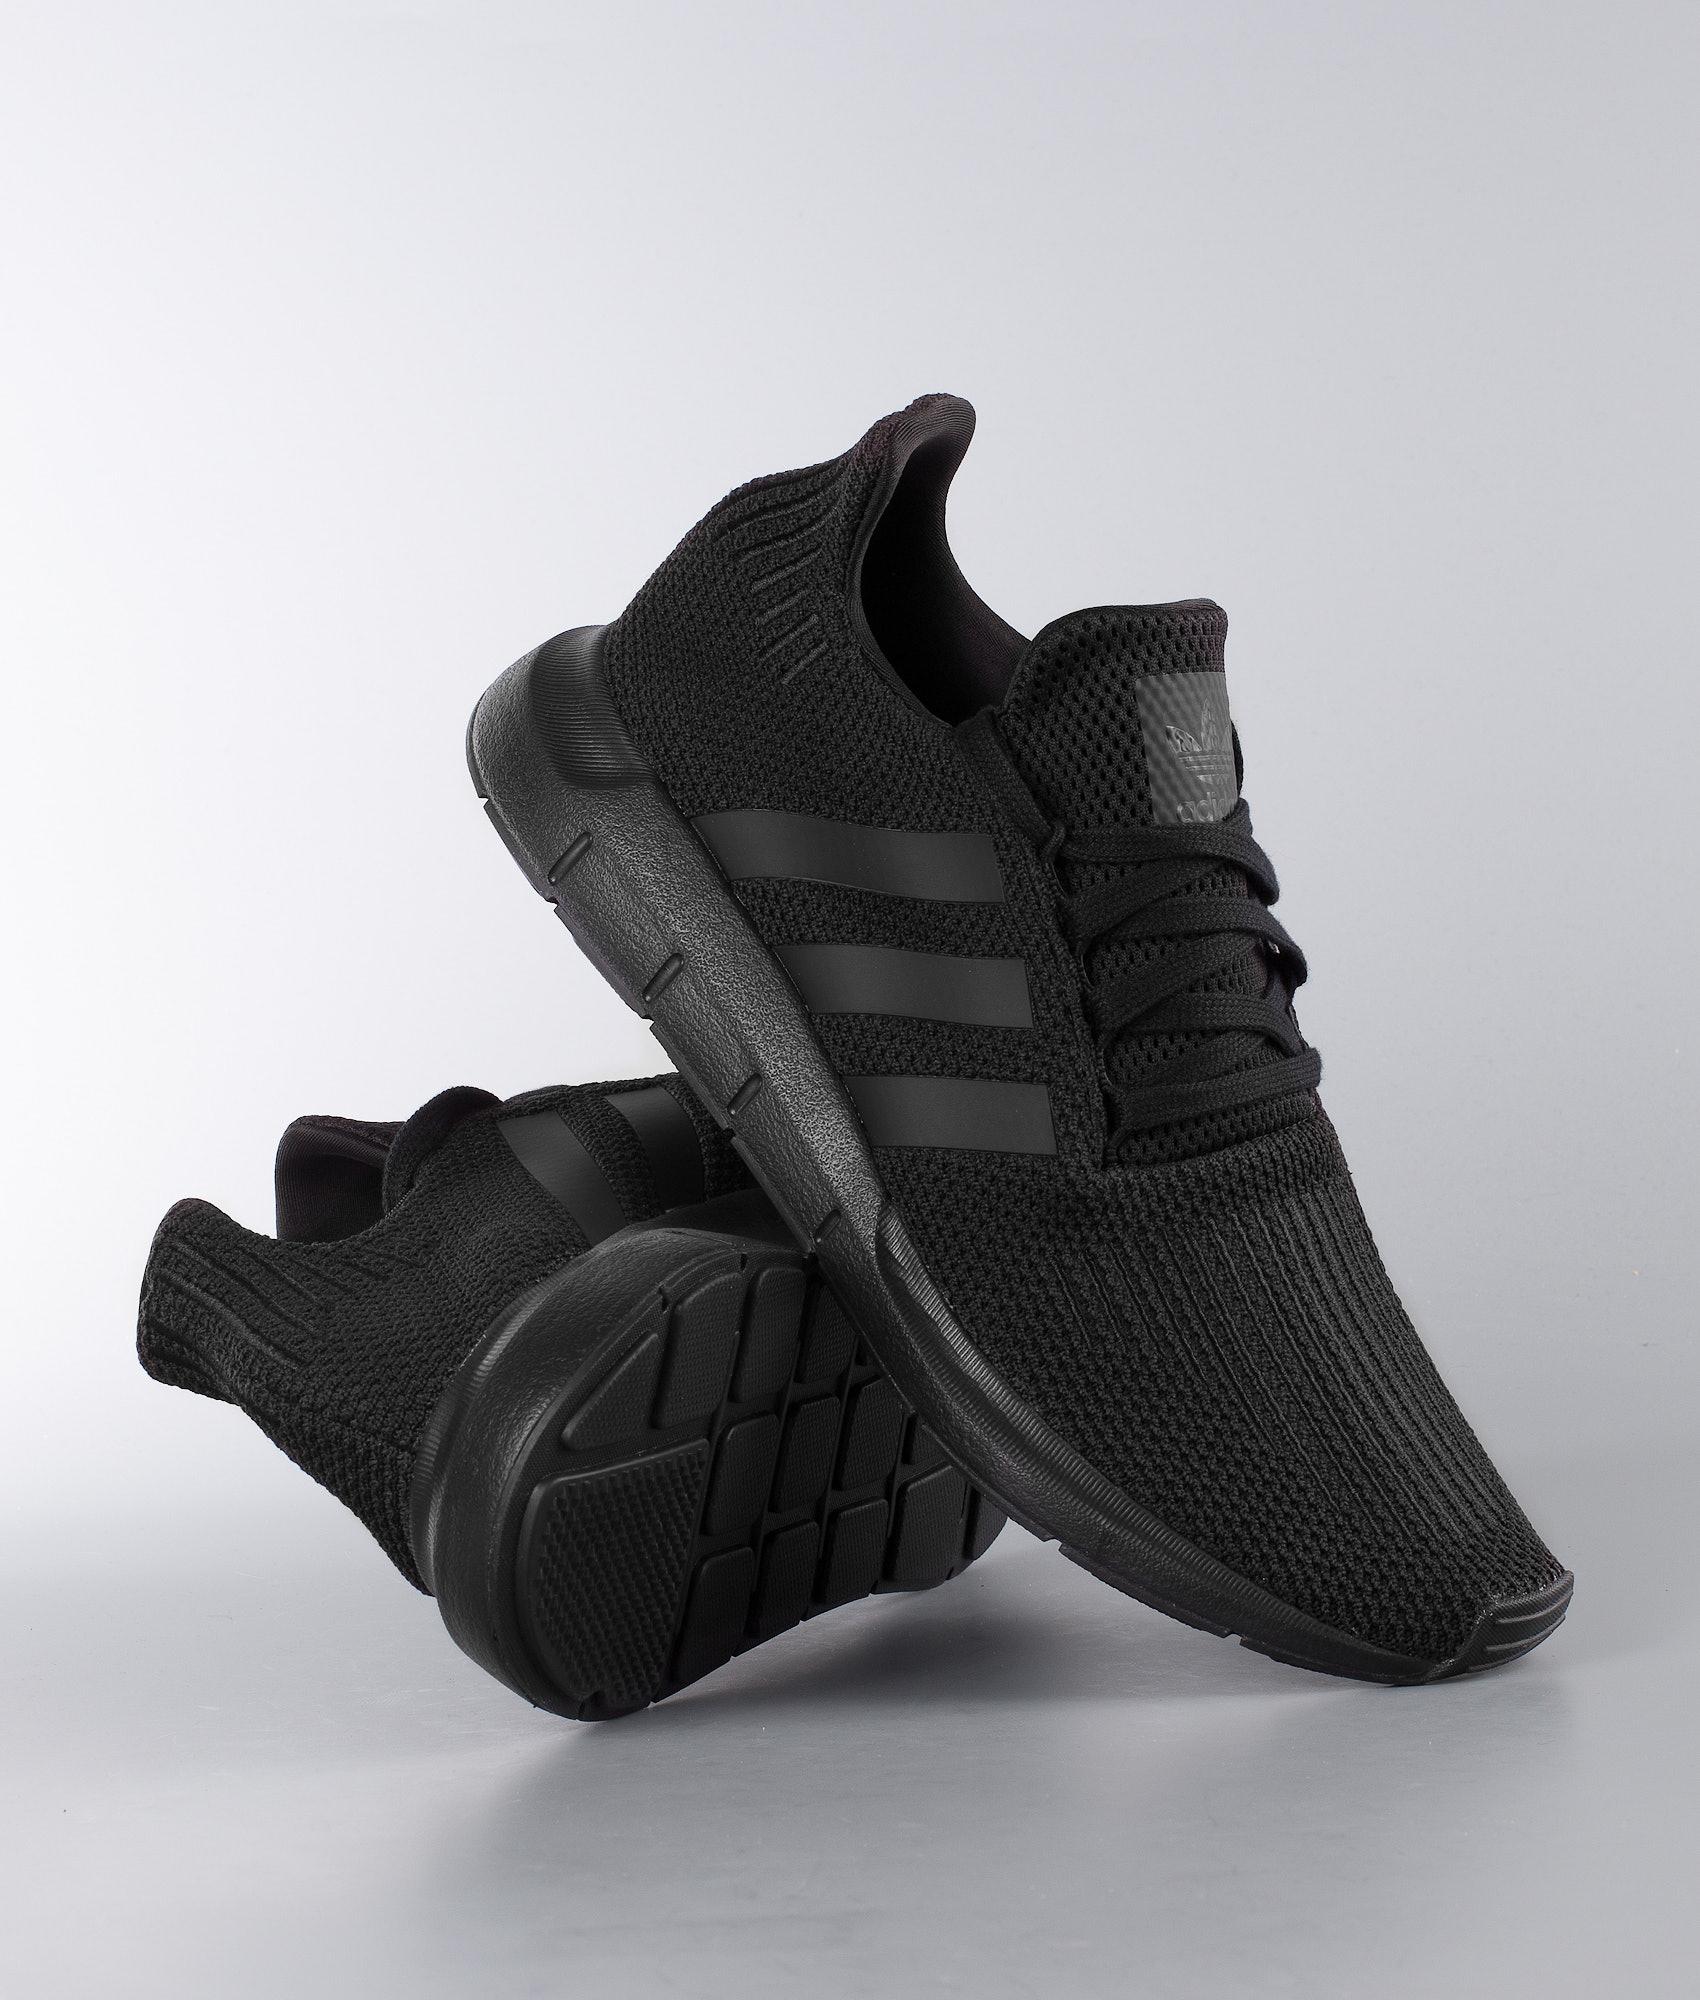 9312b042 Adidas Originals Swift Run Sko Core Black/Core Black/Ftwr White ...